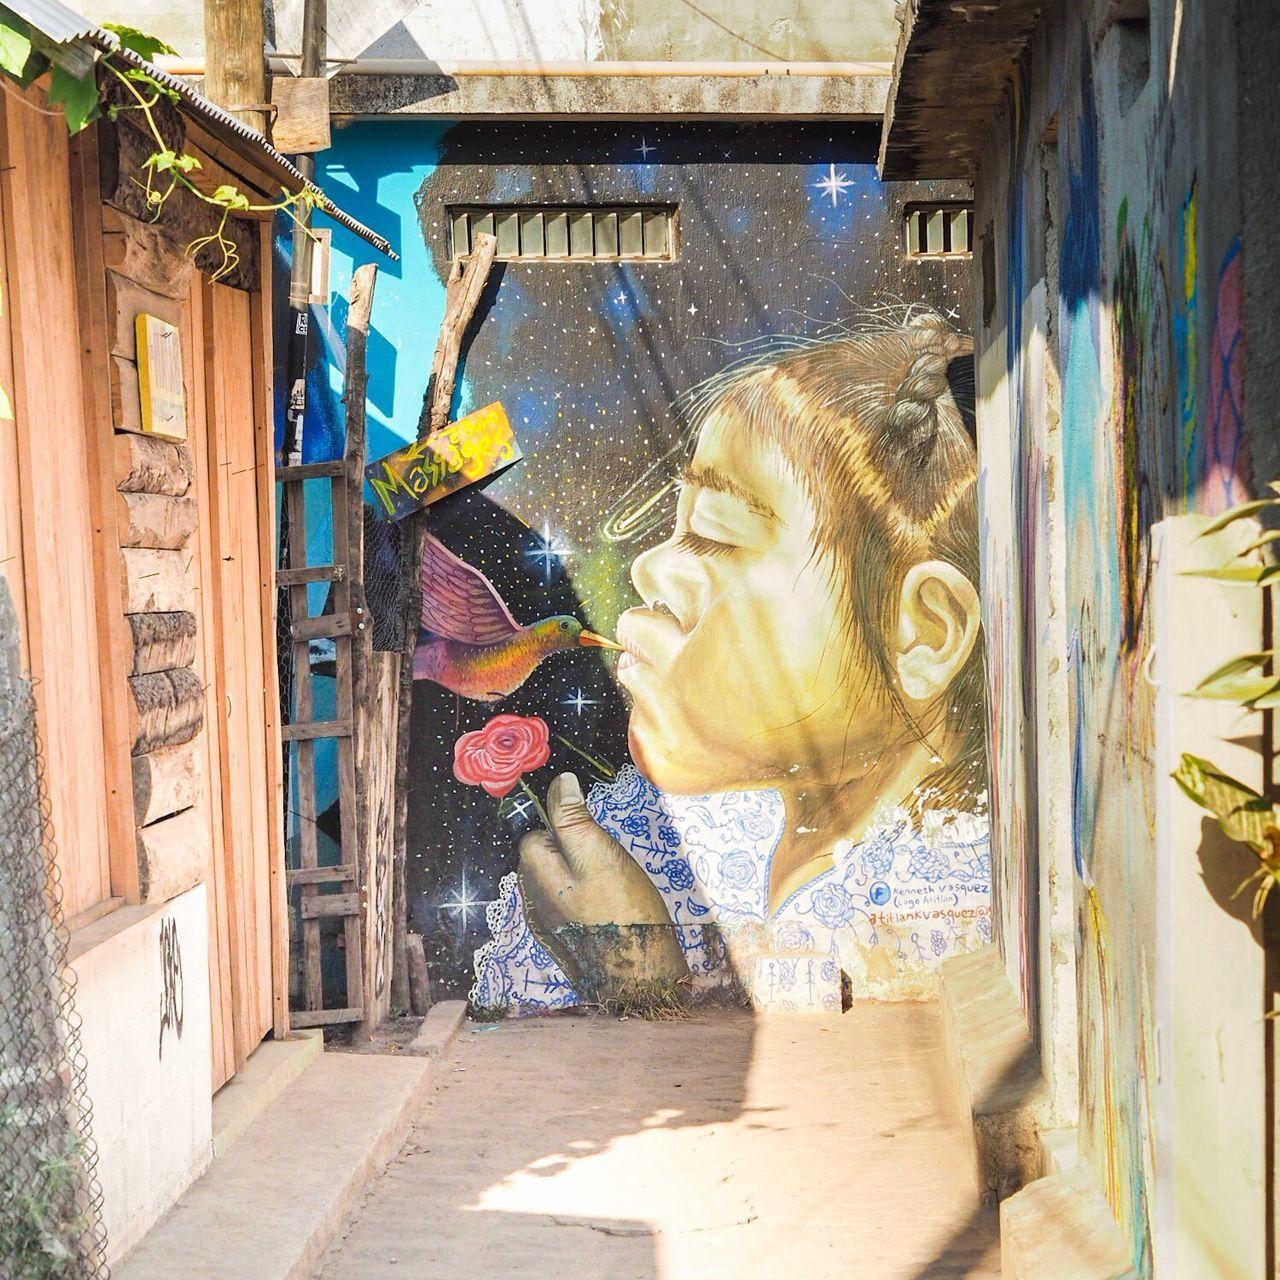 Beautiful Graffiti in San Pedro, Guatemala. Hummingbird Kissing Girl. Building Exterior Hanging Architecture Built Structure Outdoors Day No People Animal Themes Mammal Graffiti Graffiti Art Light And Shadow Colorful Colors Hummingbird Kiss